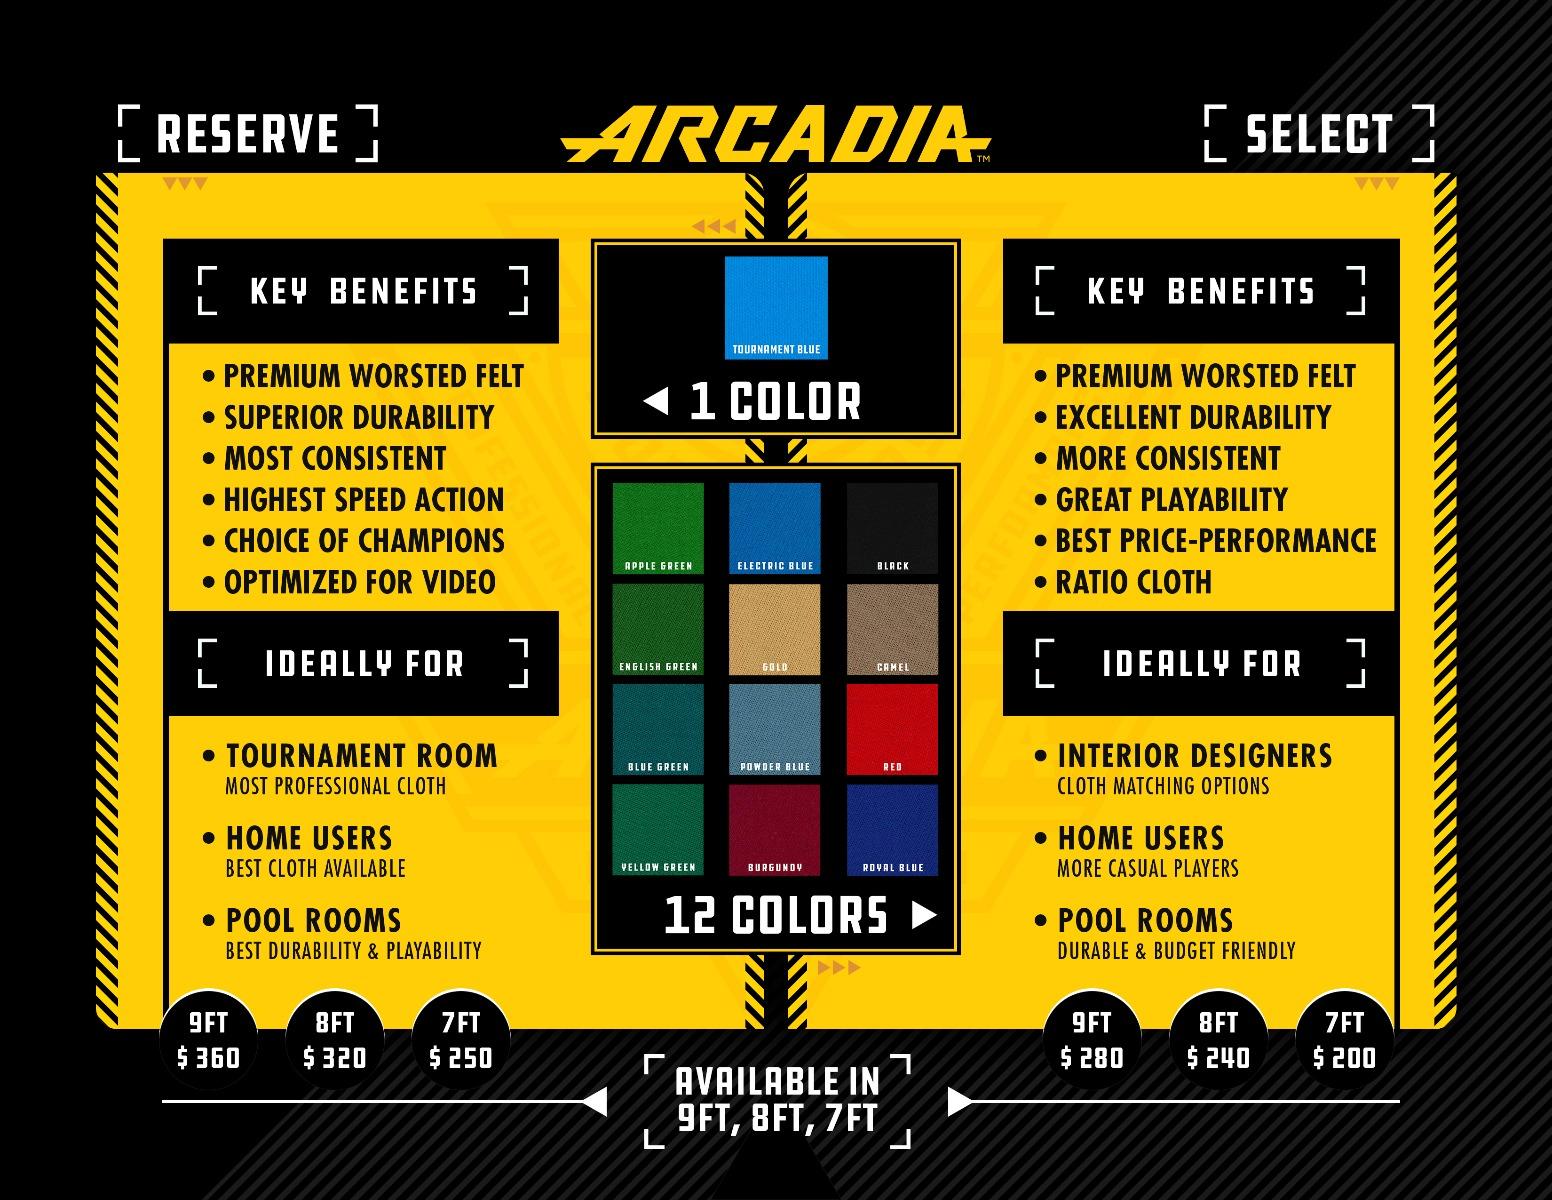 arcadia-comparison-chart.jpg